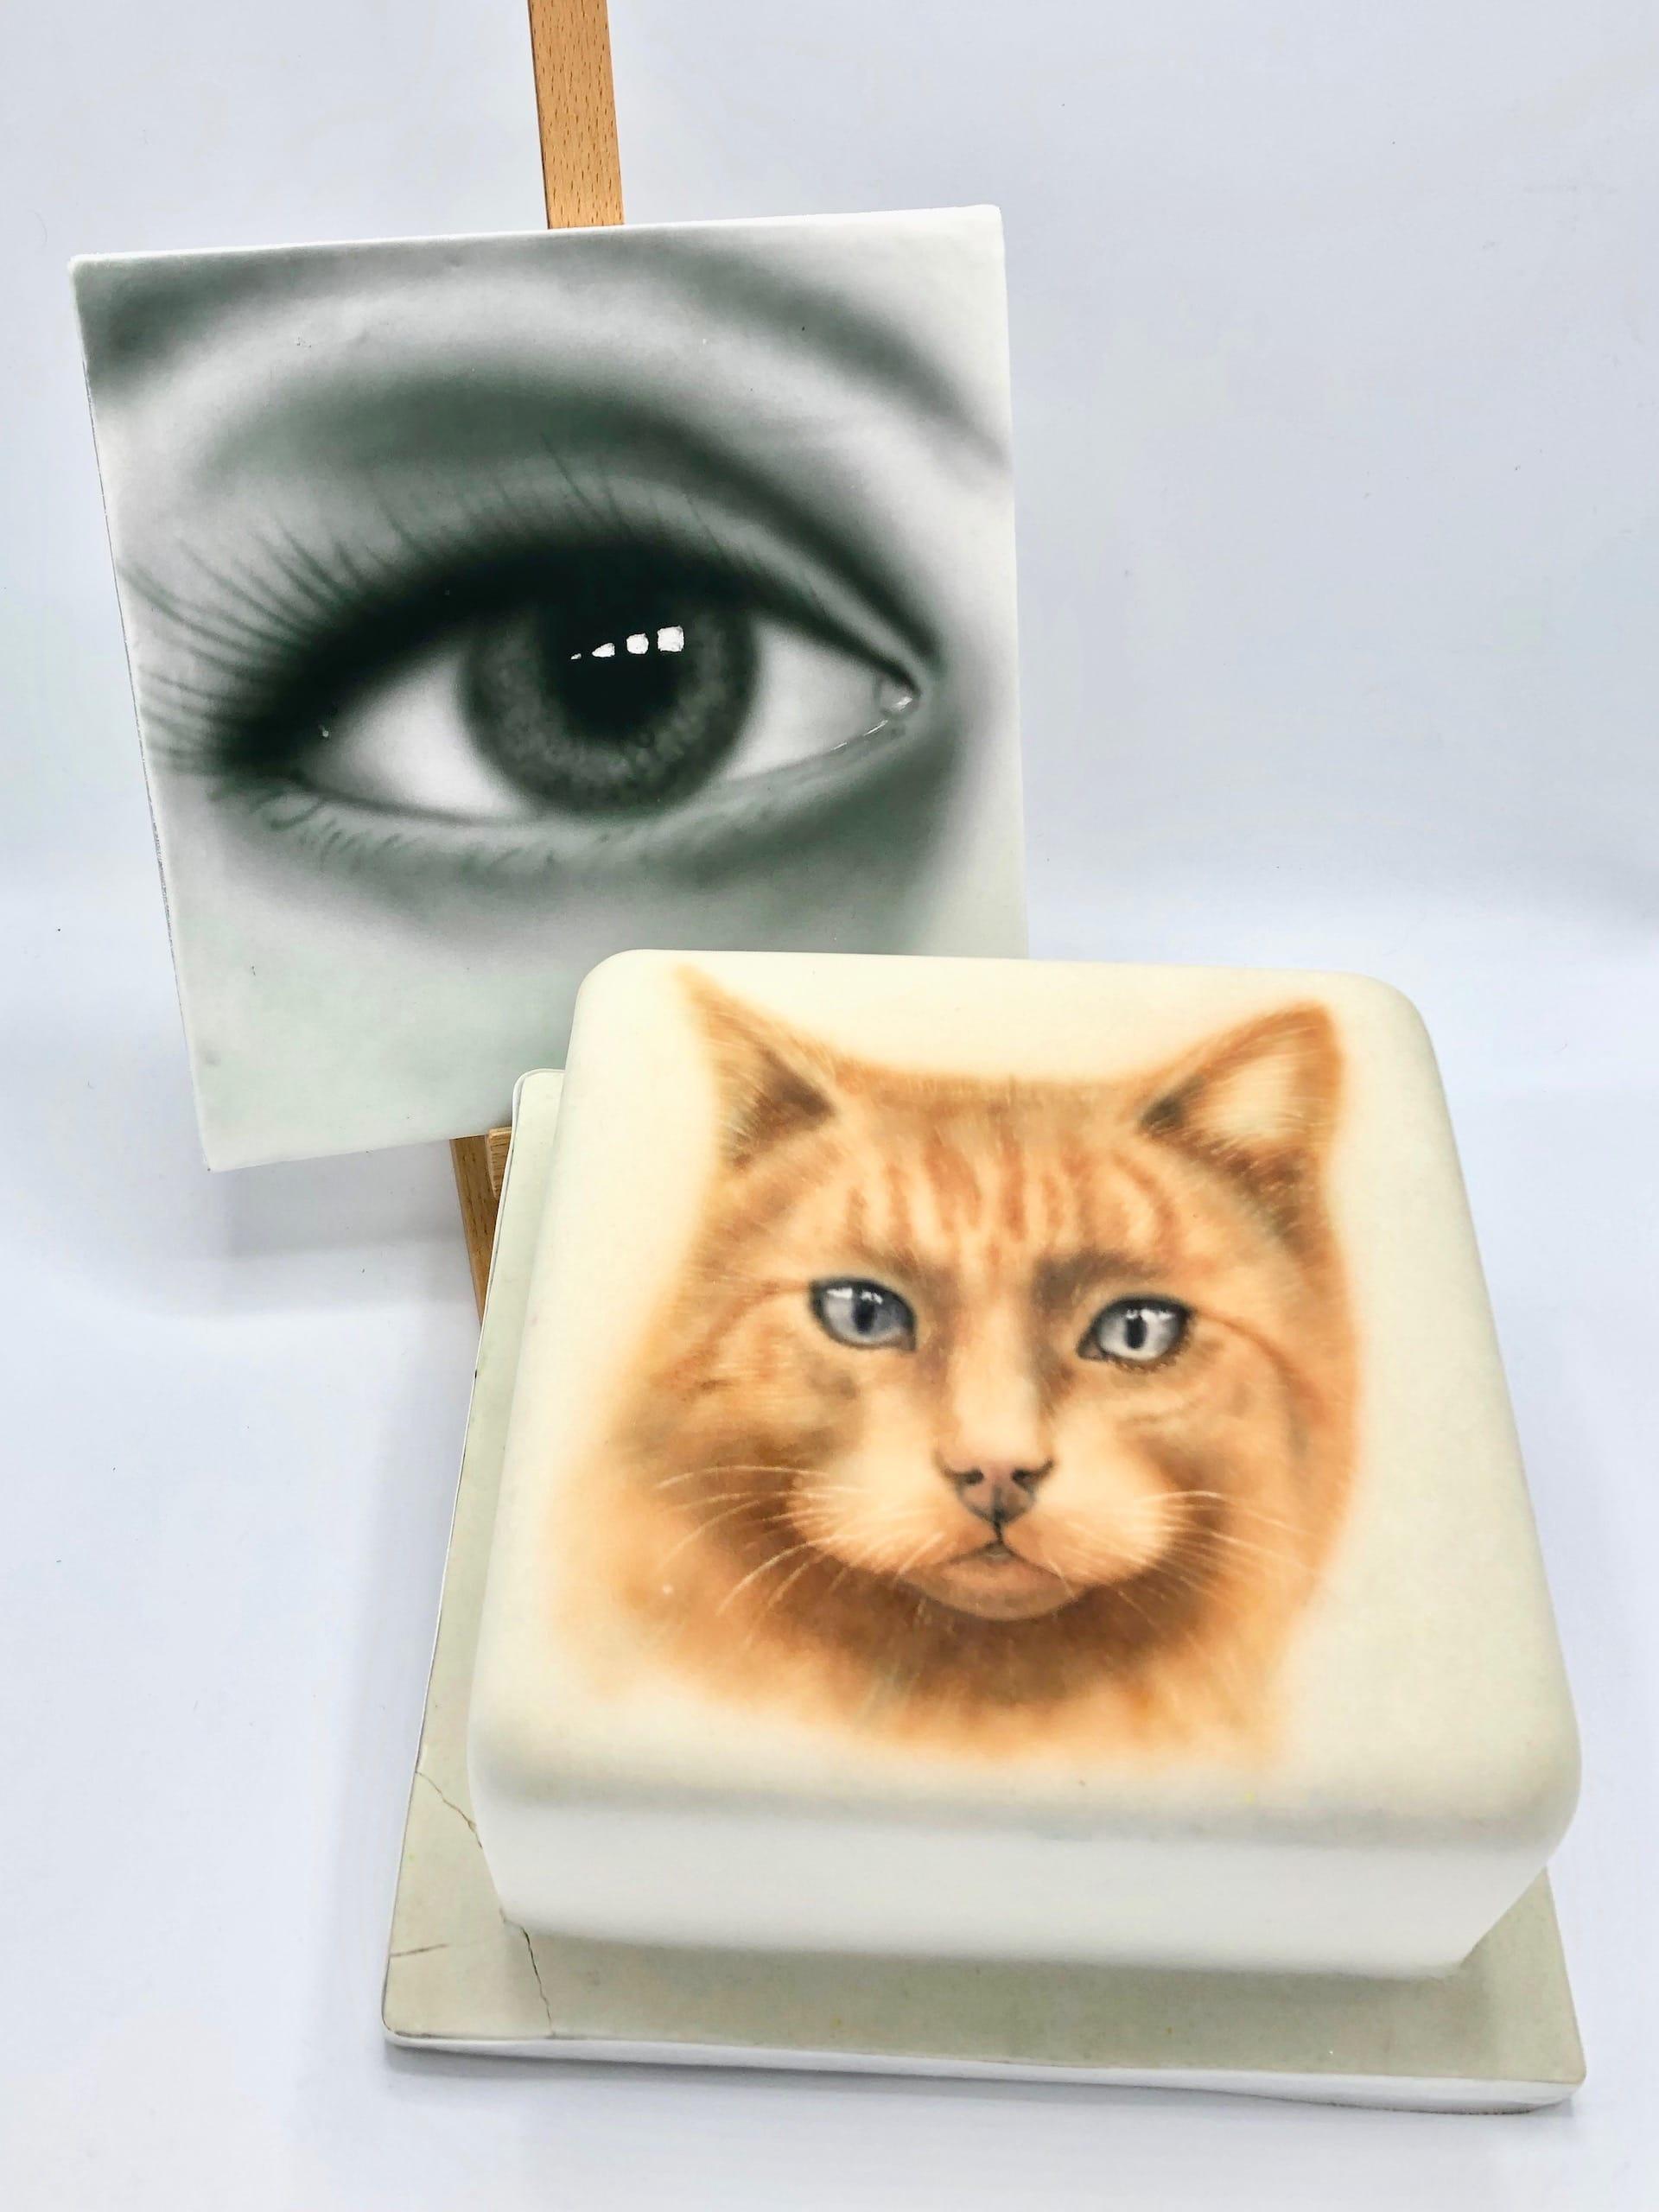 Airbrushed-cake-and-eye.jpeg